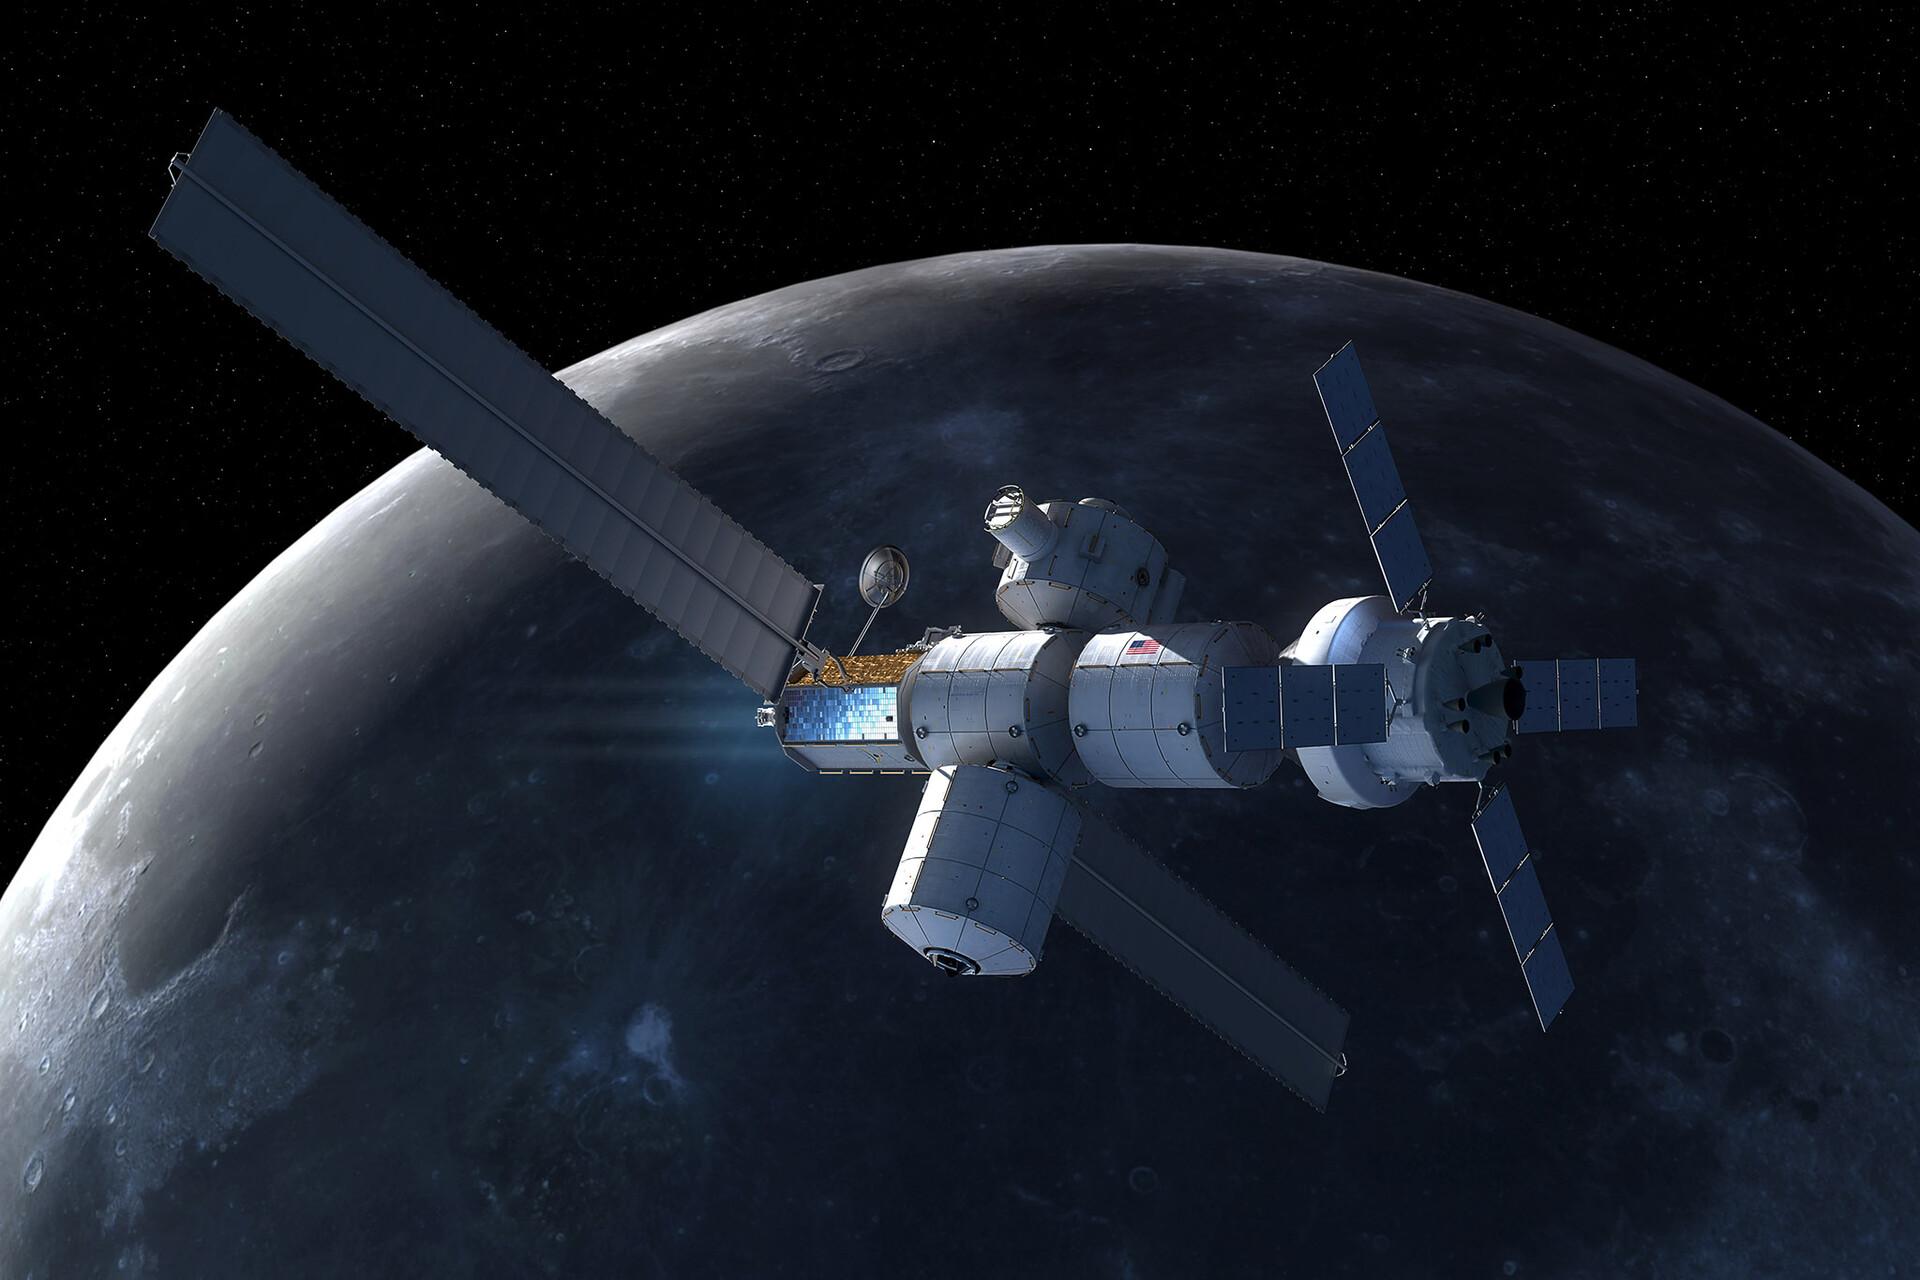 Image Copyright Lockheed Martin, used with permission